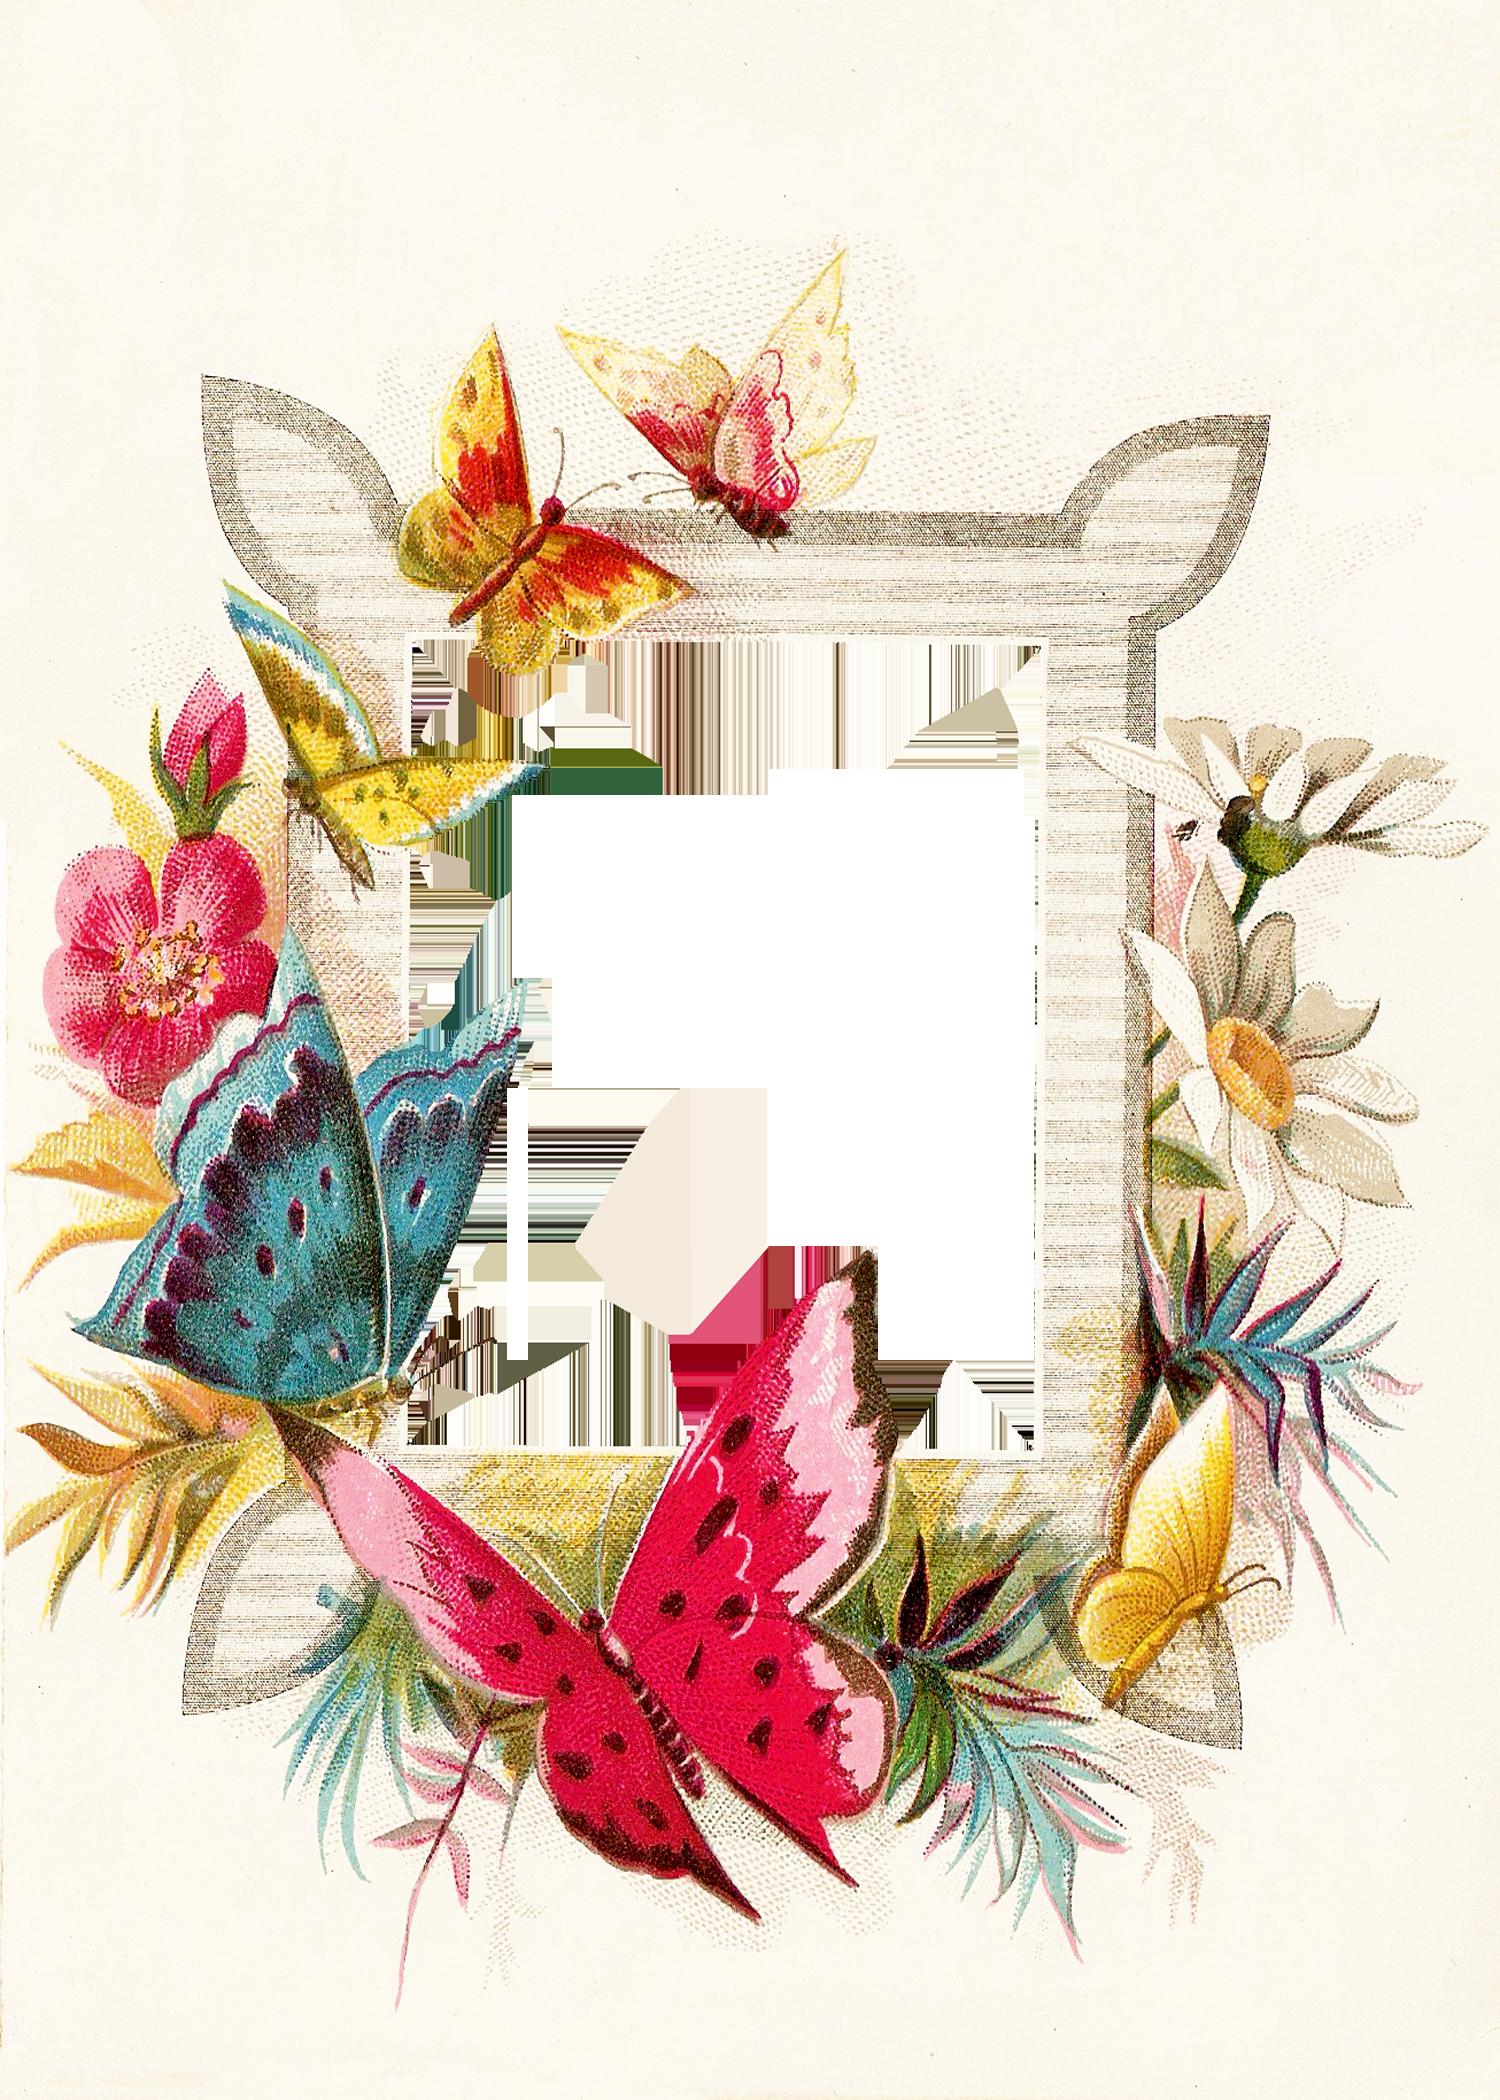 catnipstudiocollage free vintage clip art a circlet of